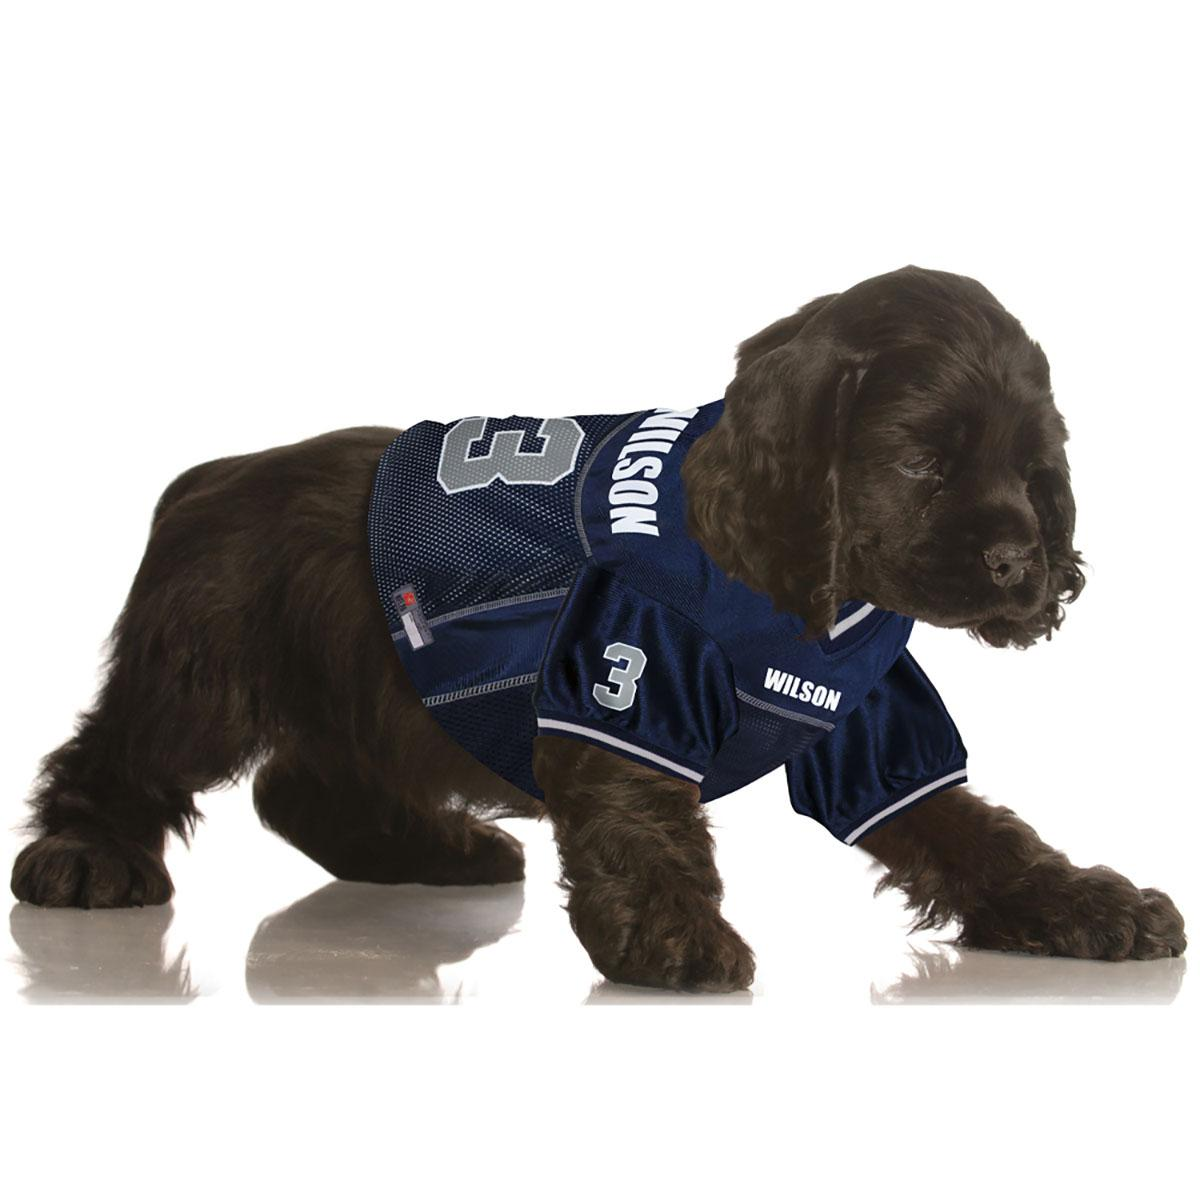 Russell Wilson Dog Jersey